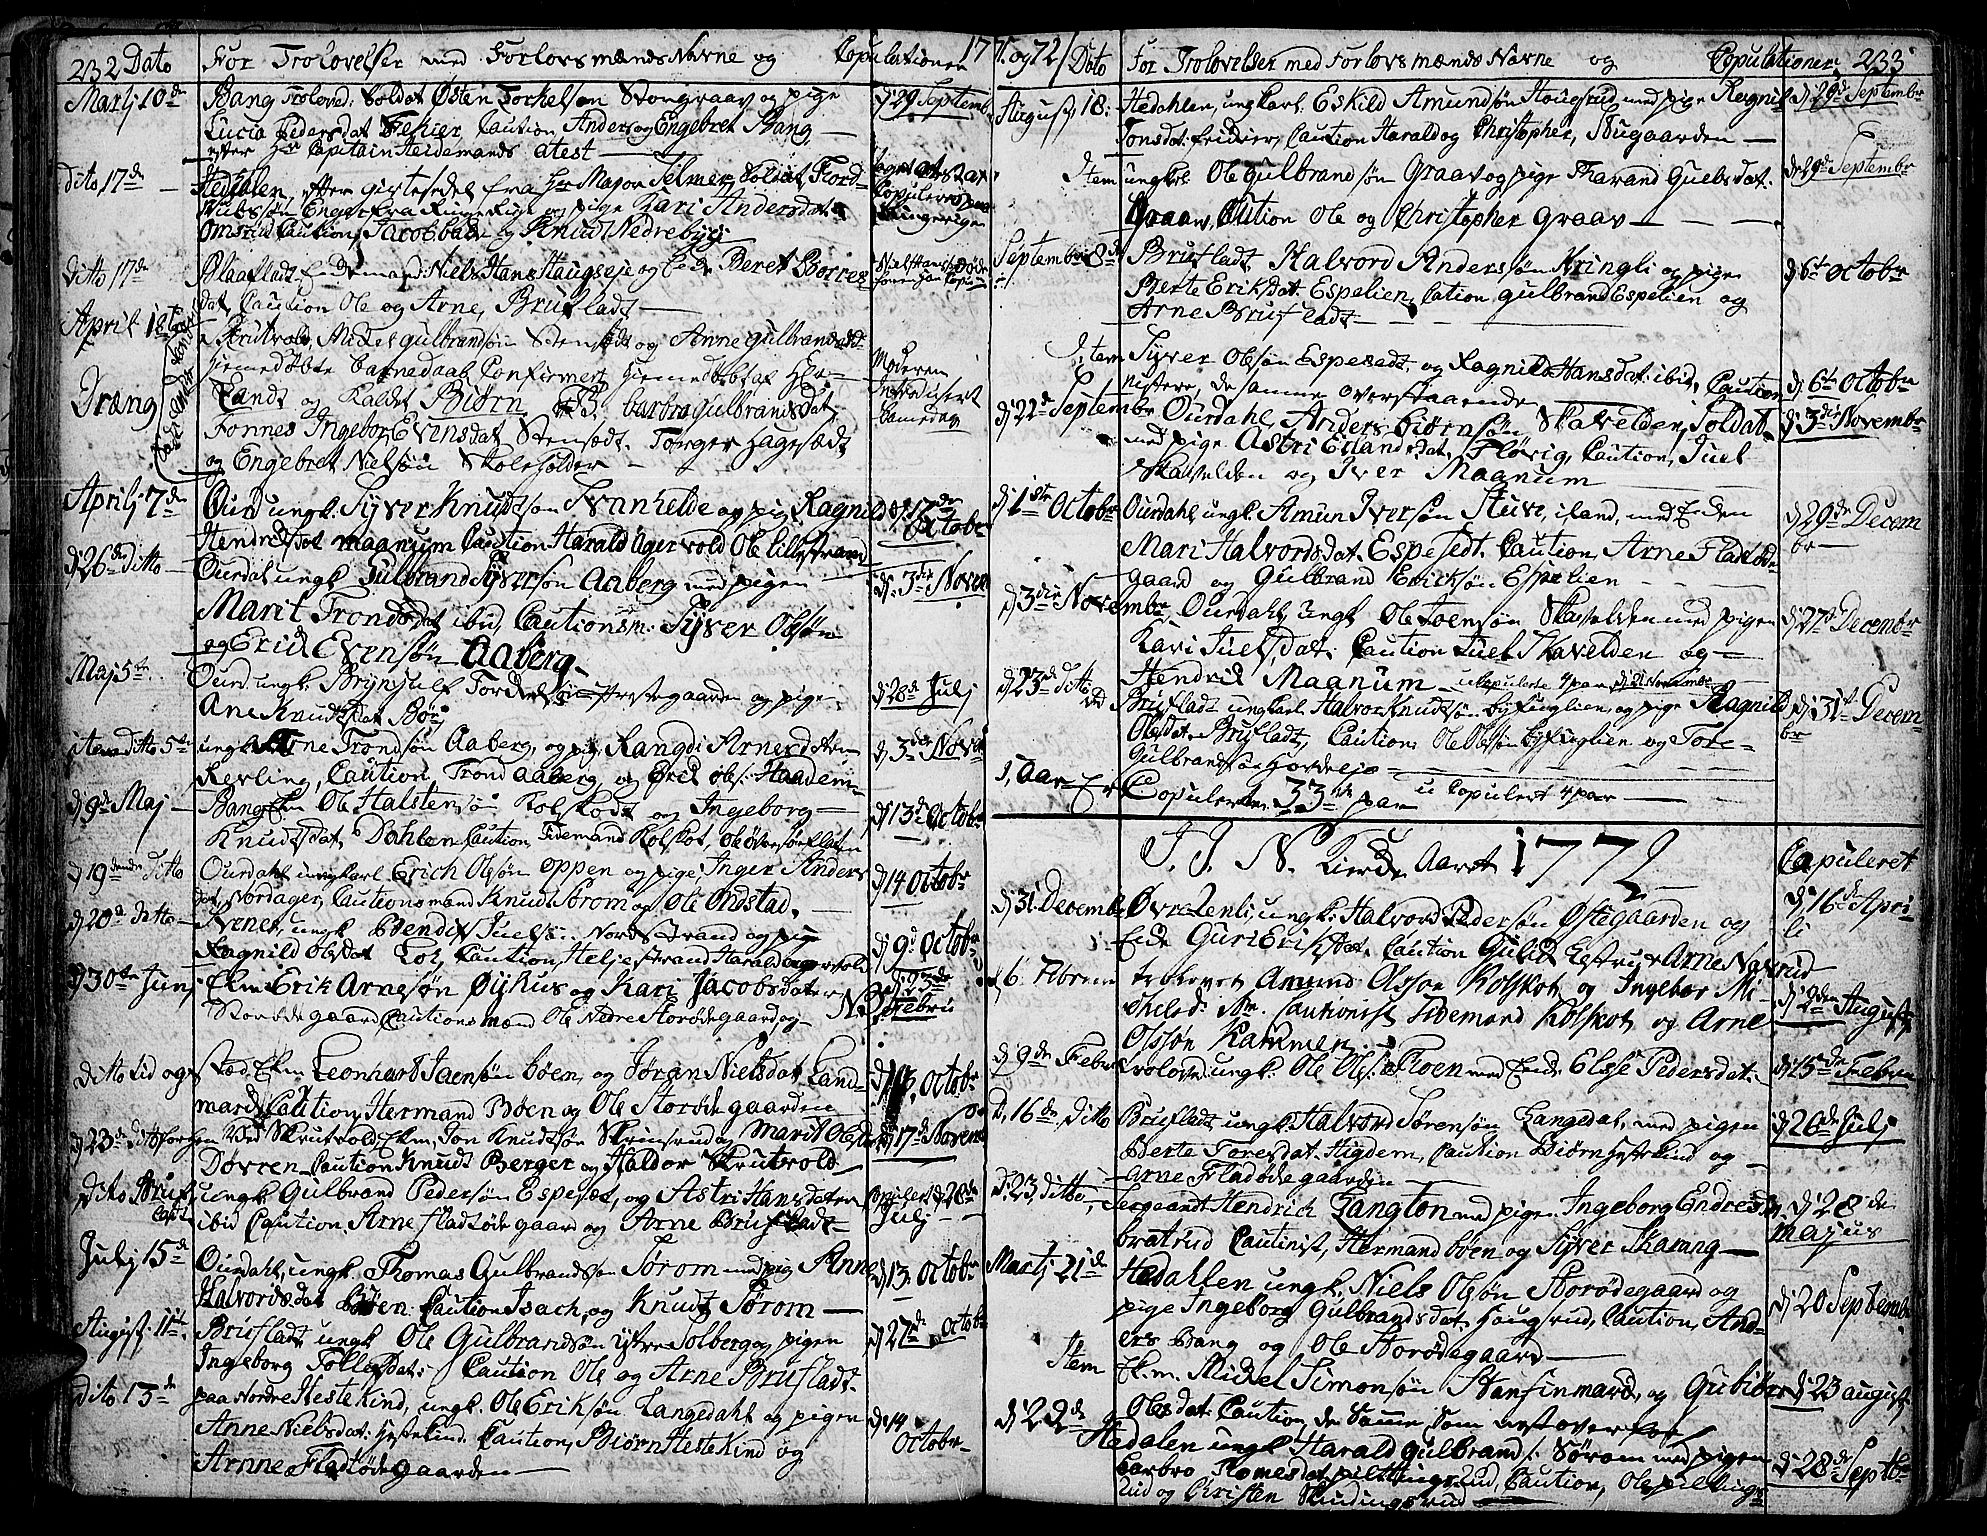 SAH, Aurdal prestekontor, Ministerialbok nr. 5, 1763-1781, s. 232-233